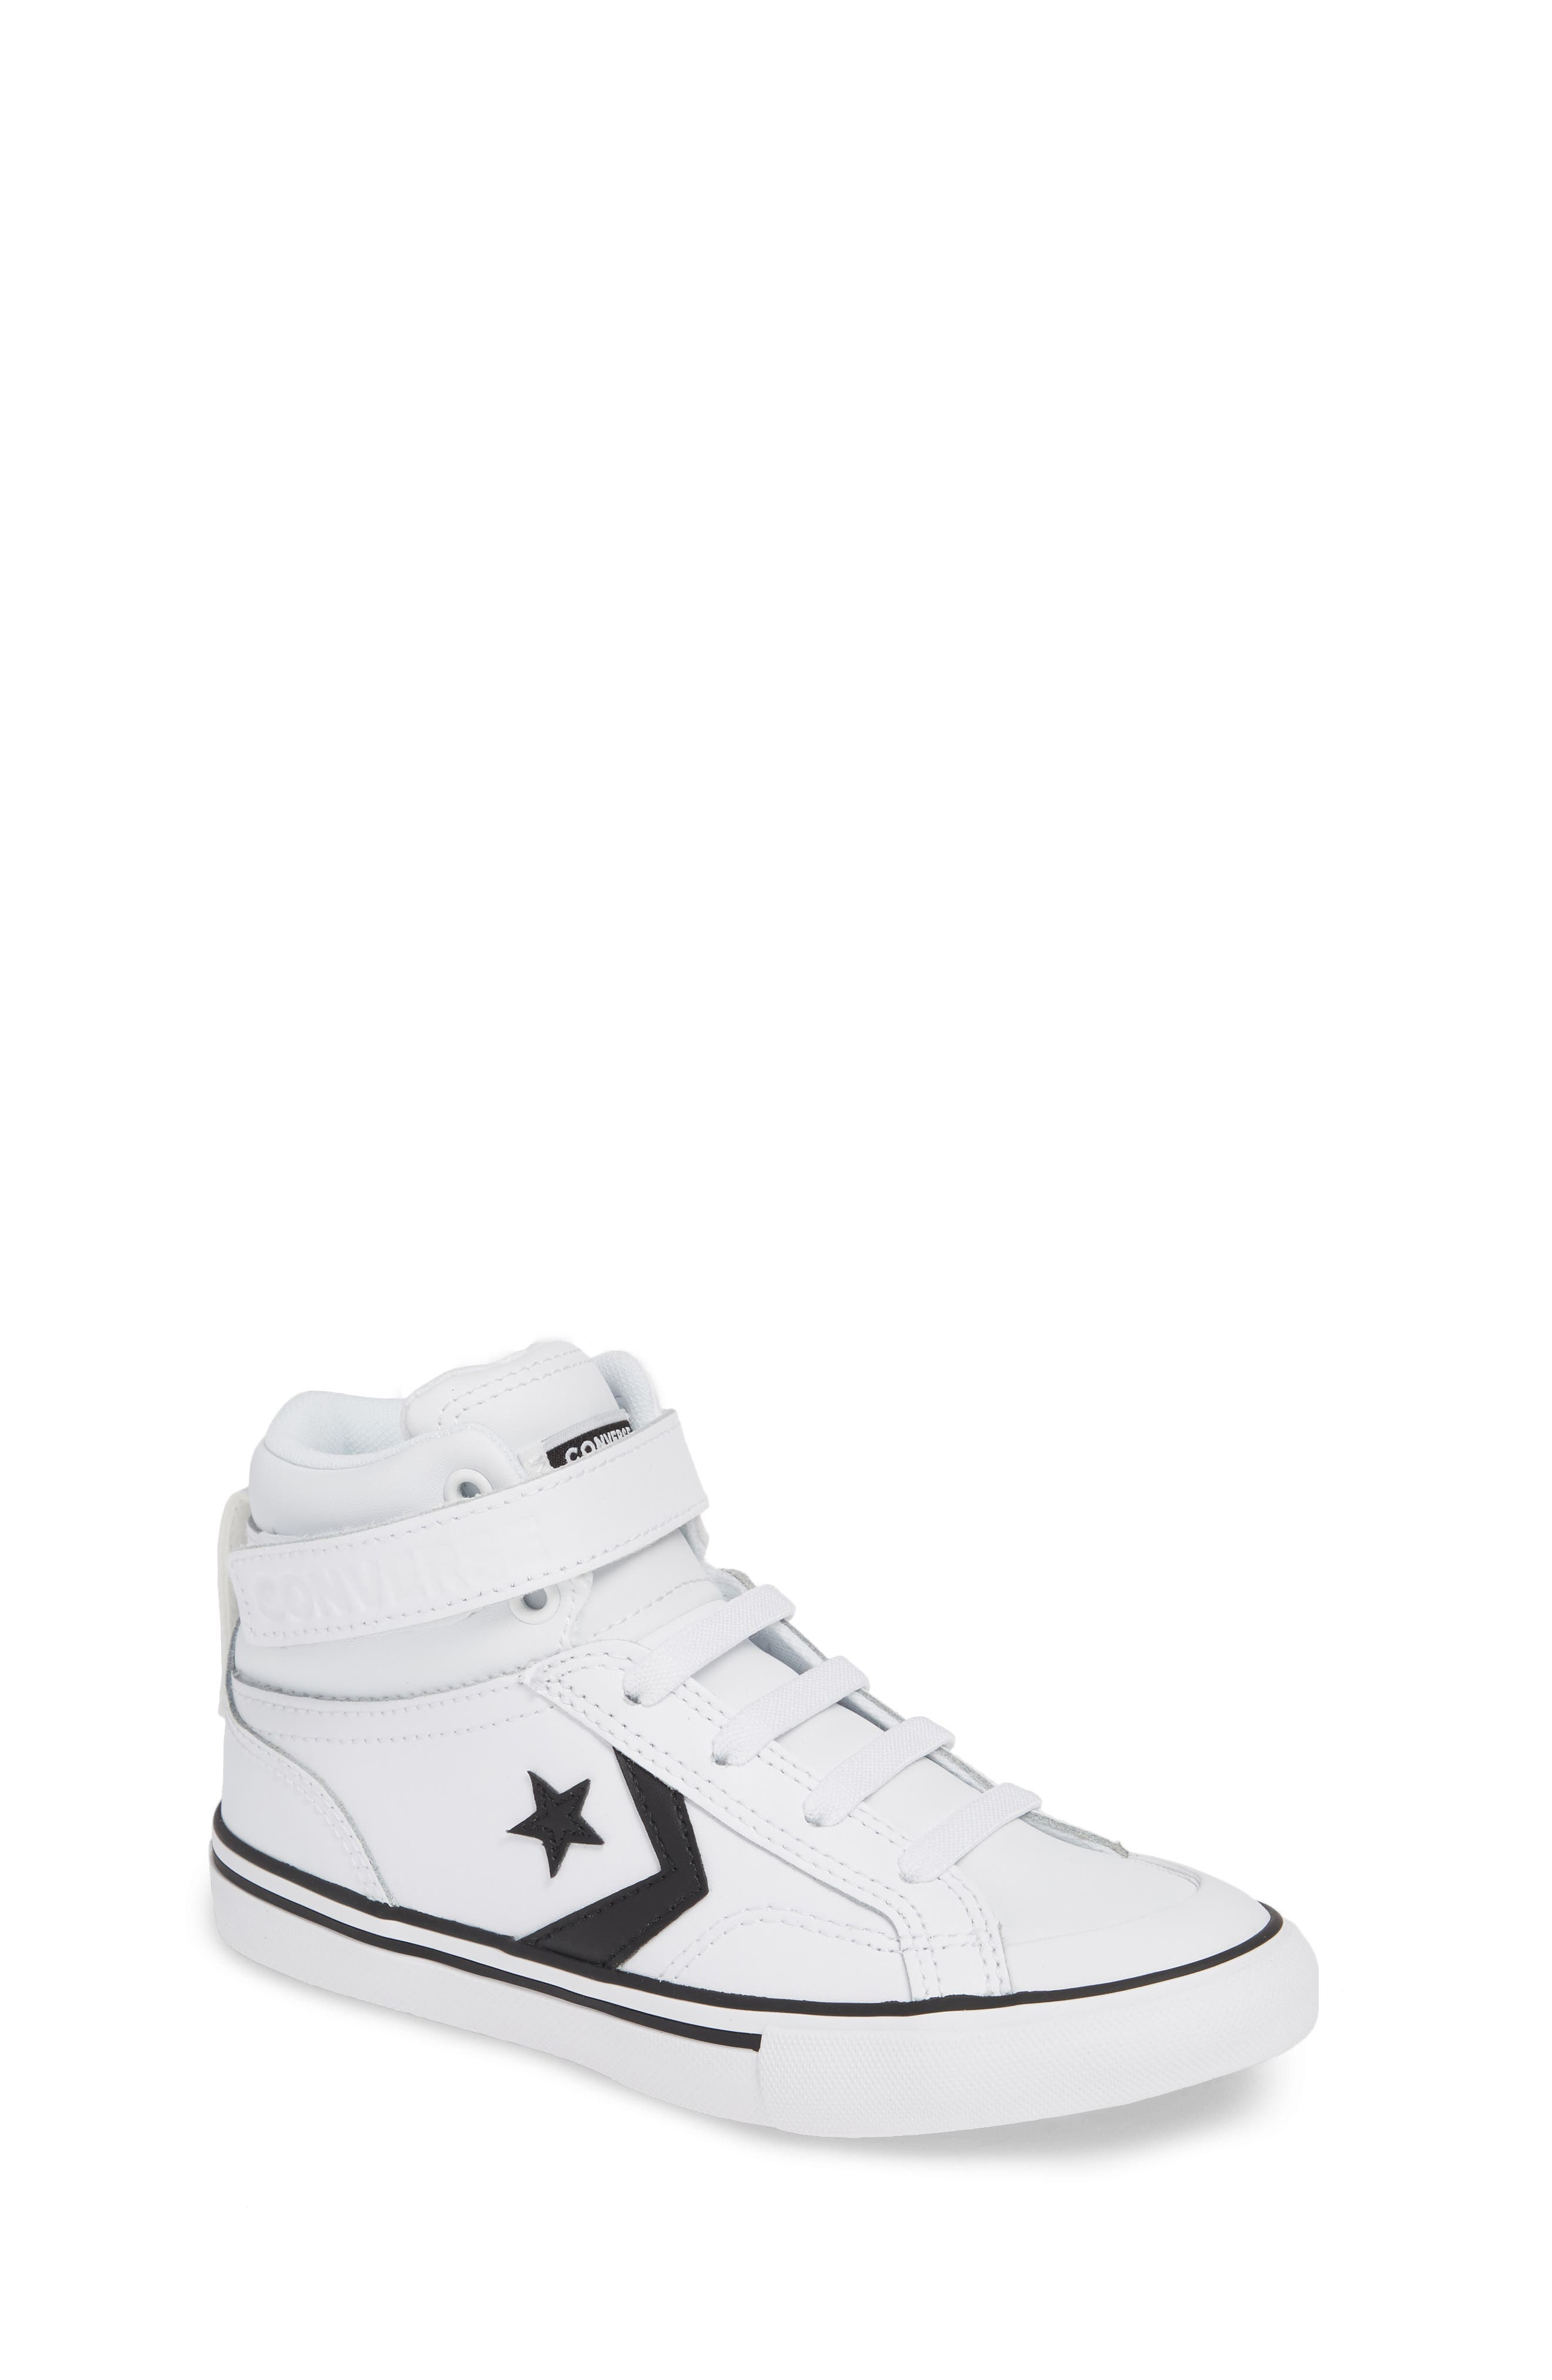 Pro Blaze High Top Sneaker,                         Main,                         color, 102